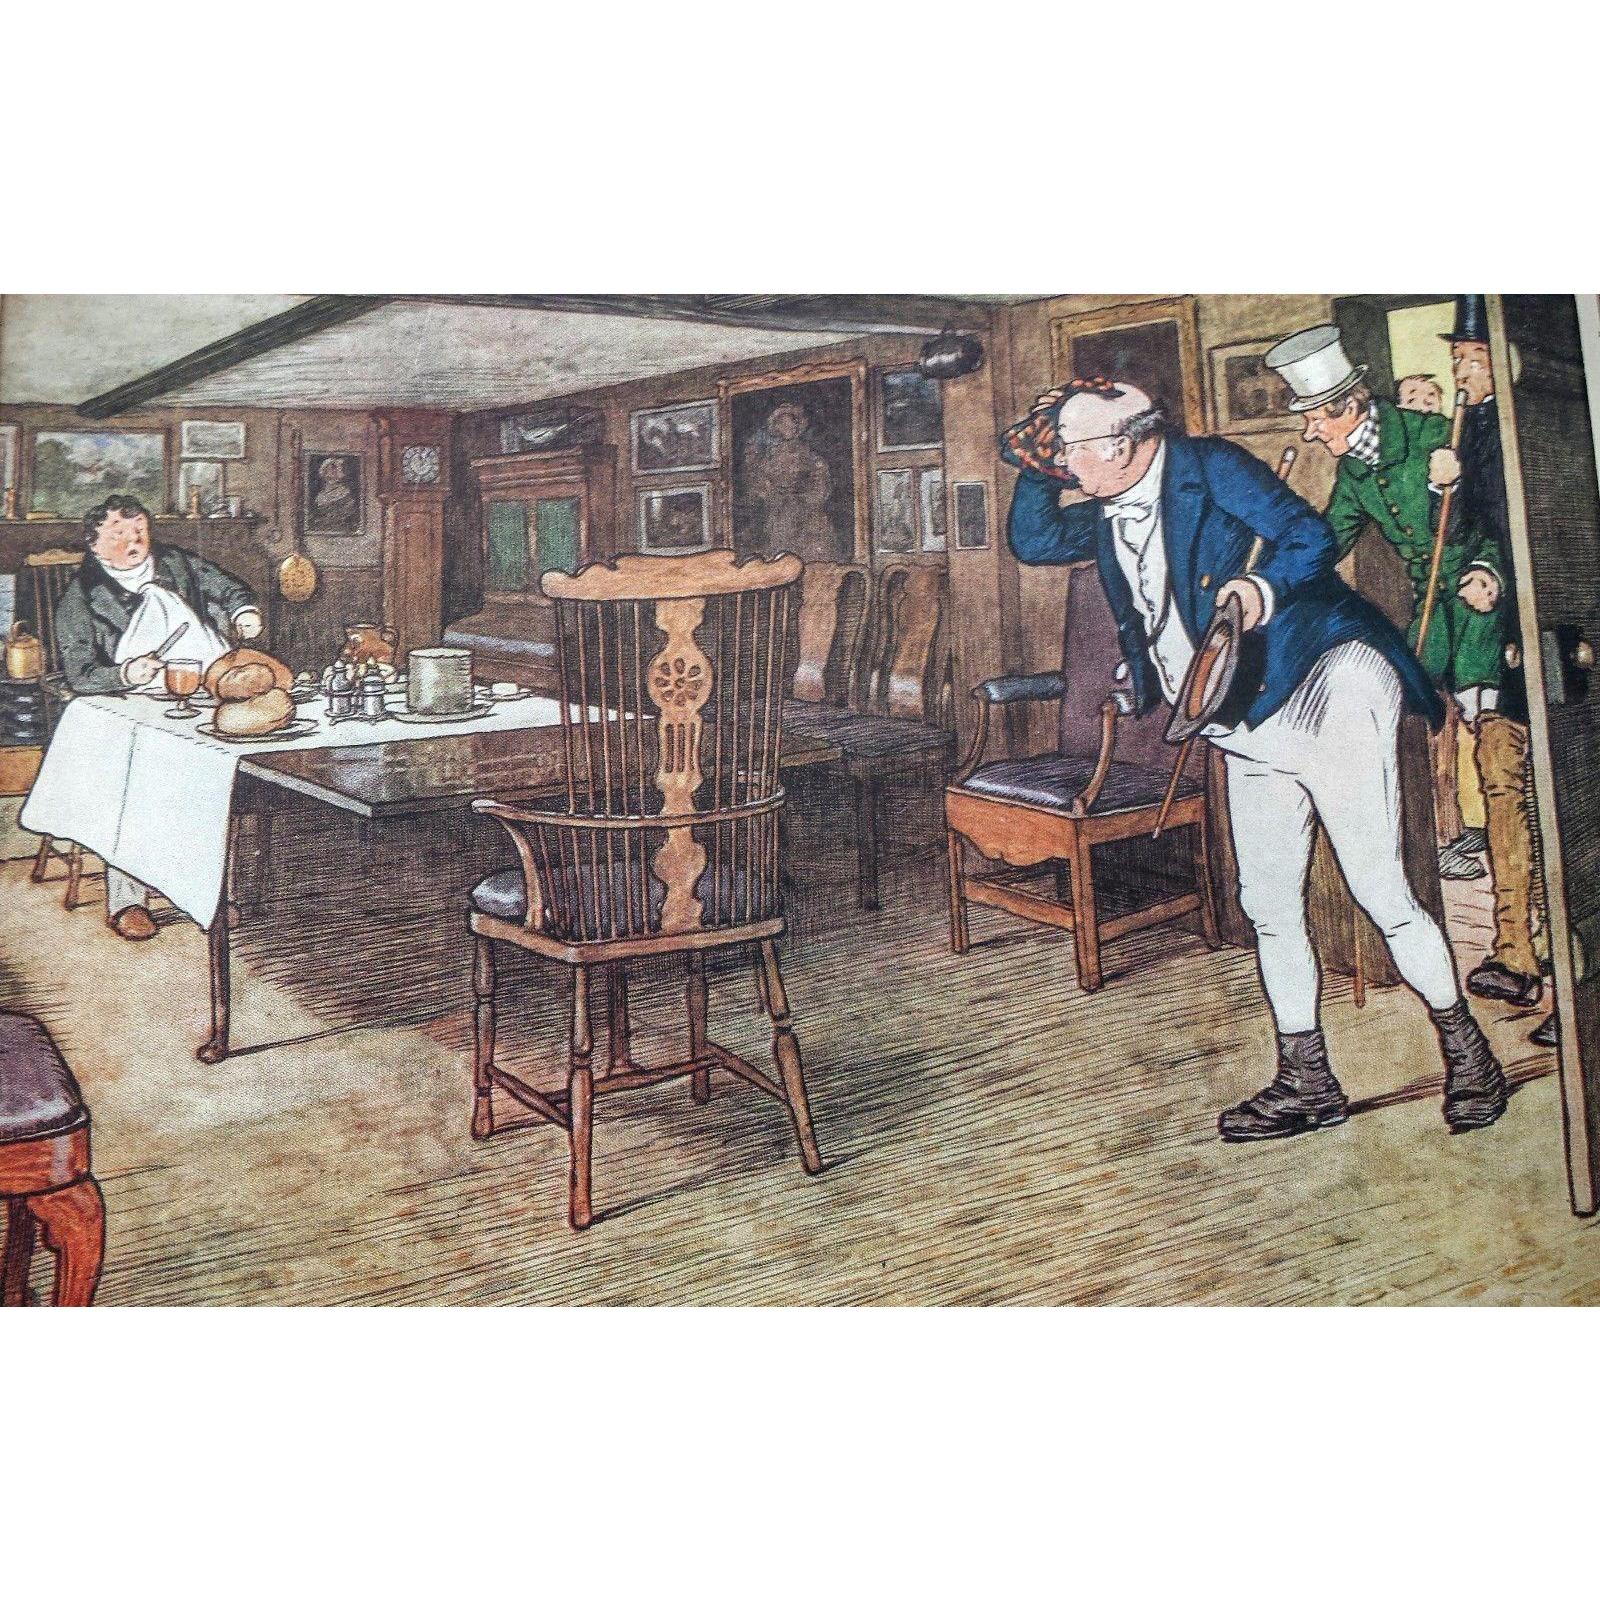 Set Vintage Cecil Aldin Pictures from Pickwick Prints ~ Original Matting